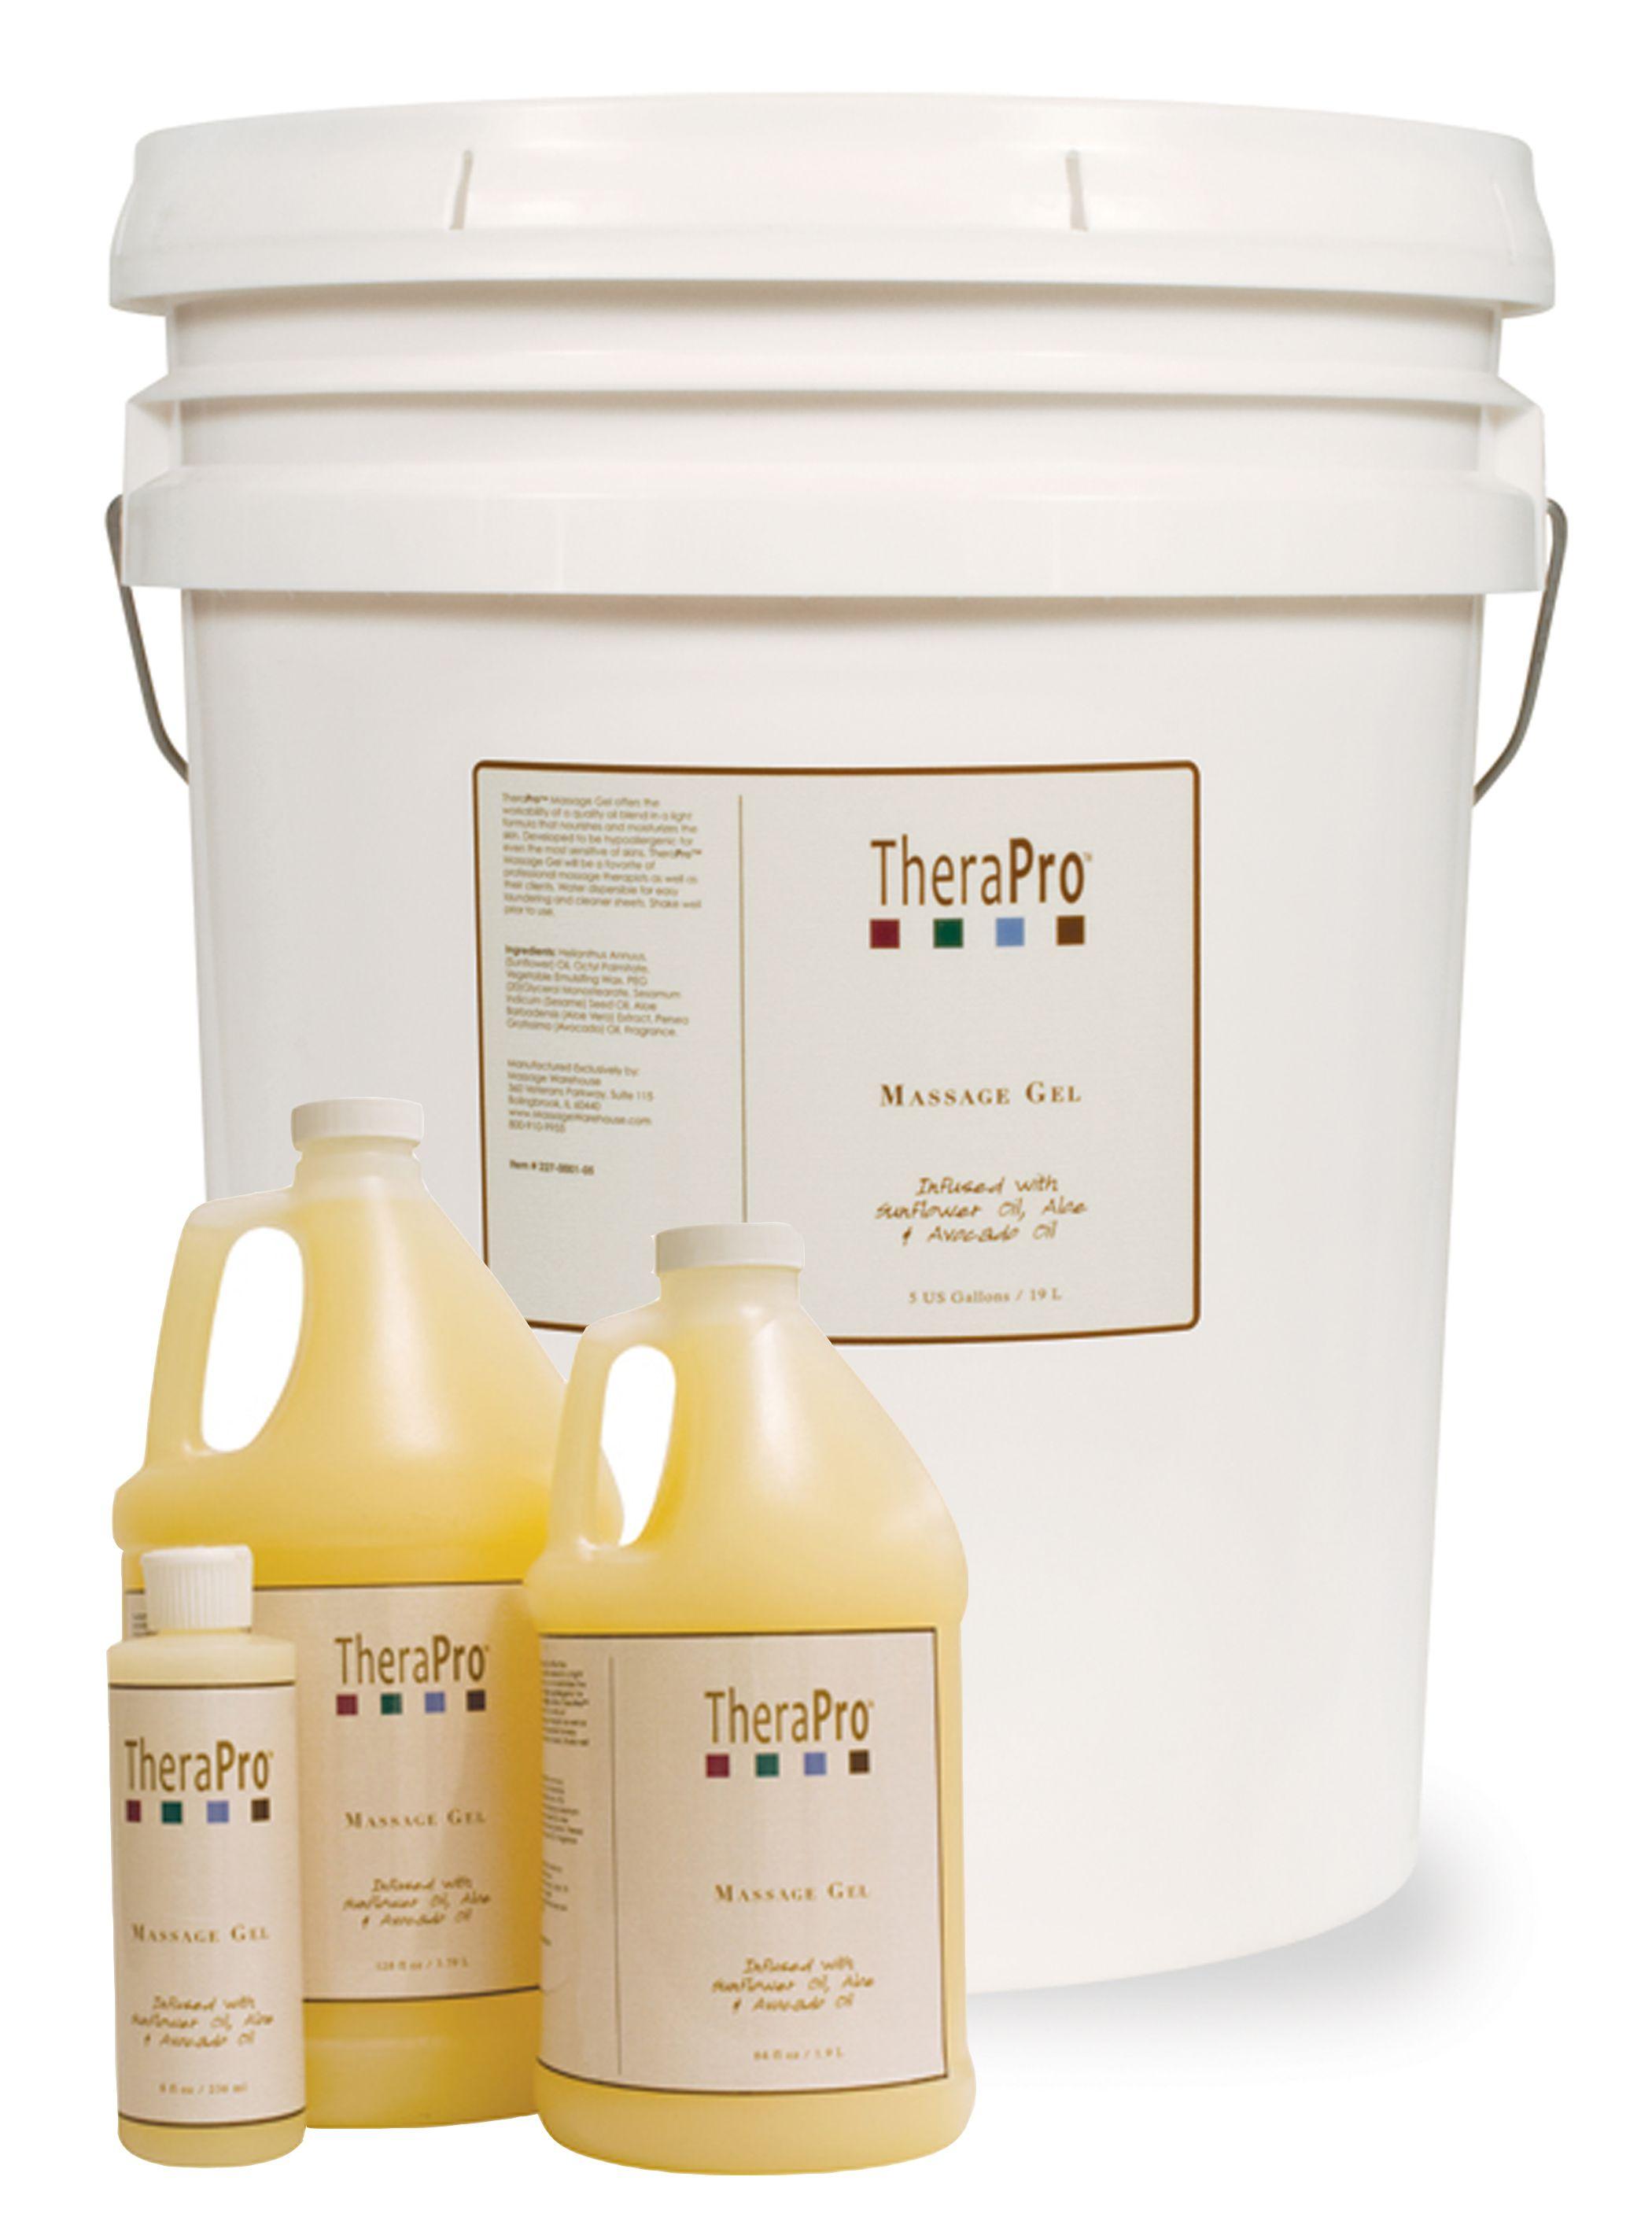 therapro massage gel massage therapy gels for sale. Black Bedroom Furniture Sets. Home Design Ideas